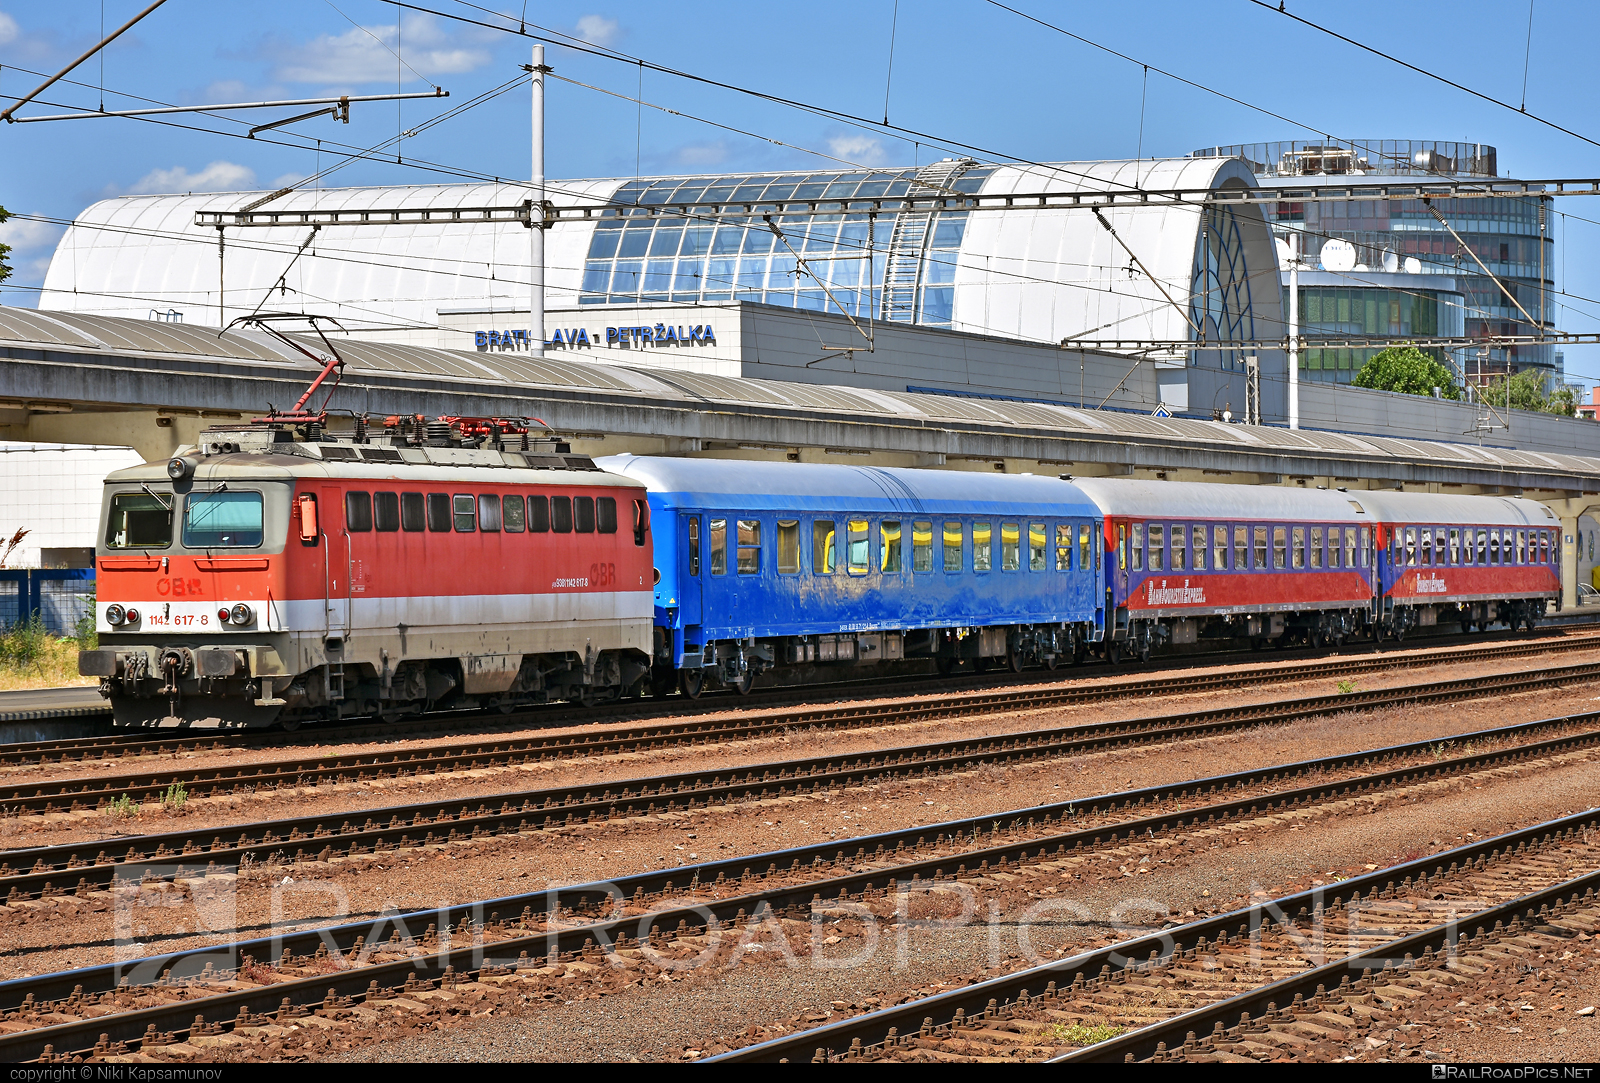 SGP ÖBB Class 1142 - 1142 617-8 operated by Pro-Lok GmbH #bahntouristikexpress #obbclass1142 #plok #pro-lok #sgp #sgp1142 #simmeringgrazpauker